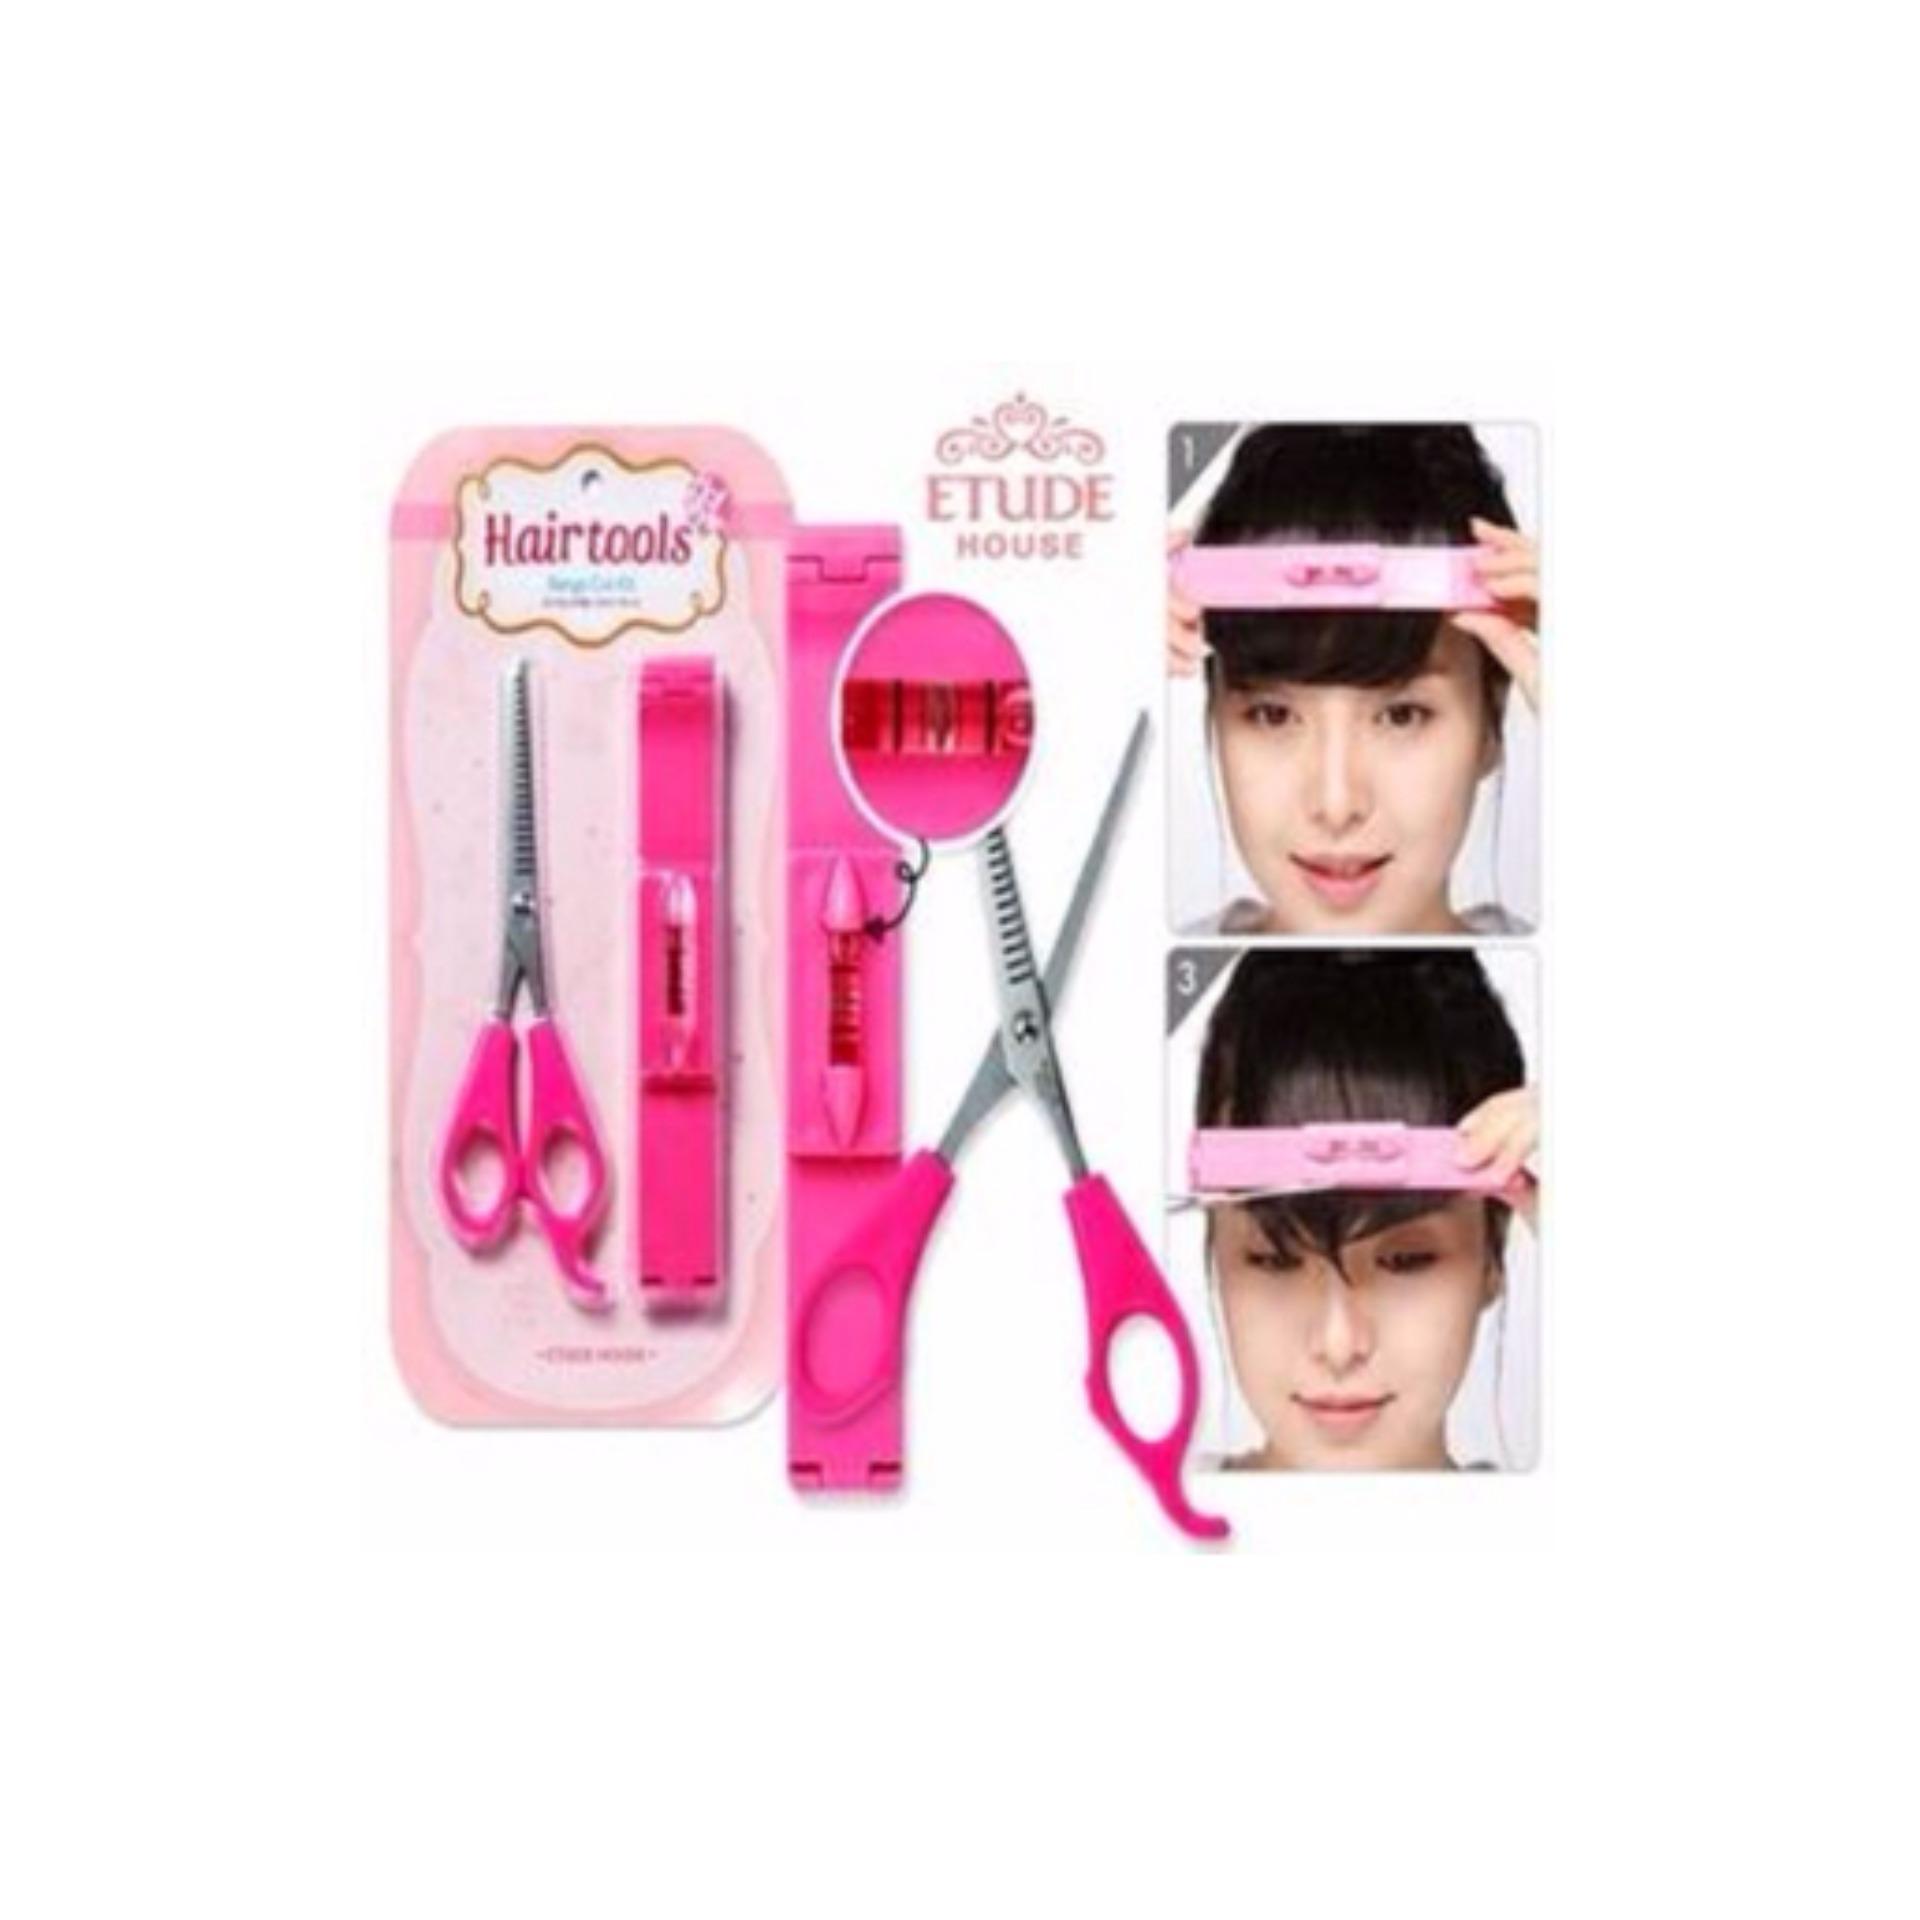 ... Alat Bantu Potong Rambut Hair Tools Gunting Poni Artifact Bangs cut ... ff3a67885d